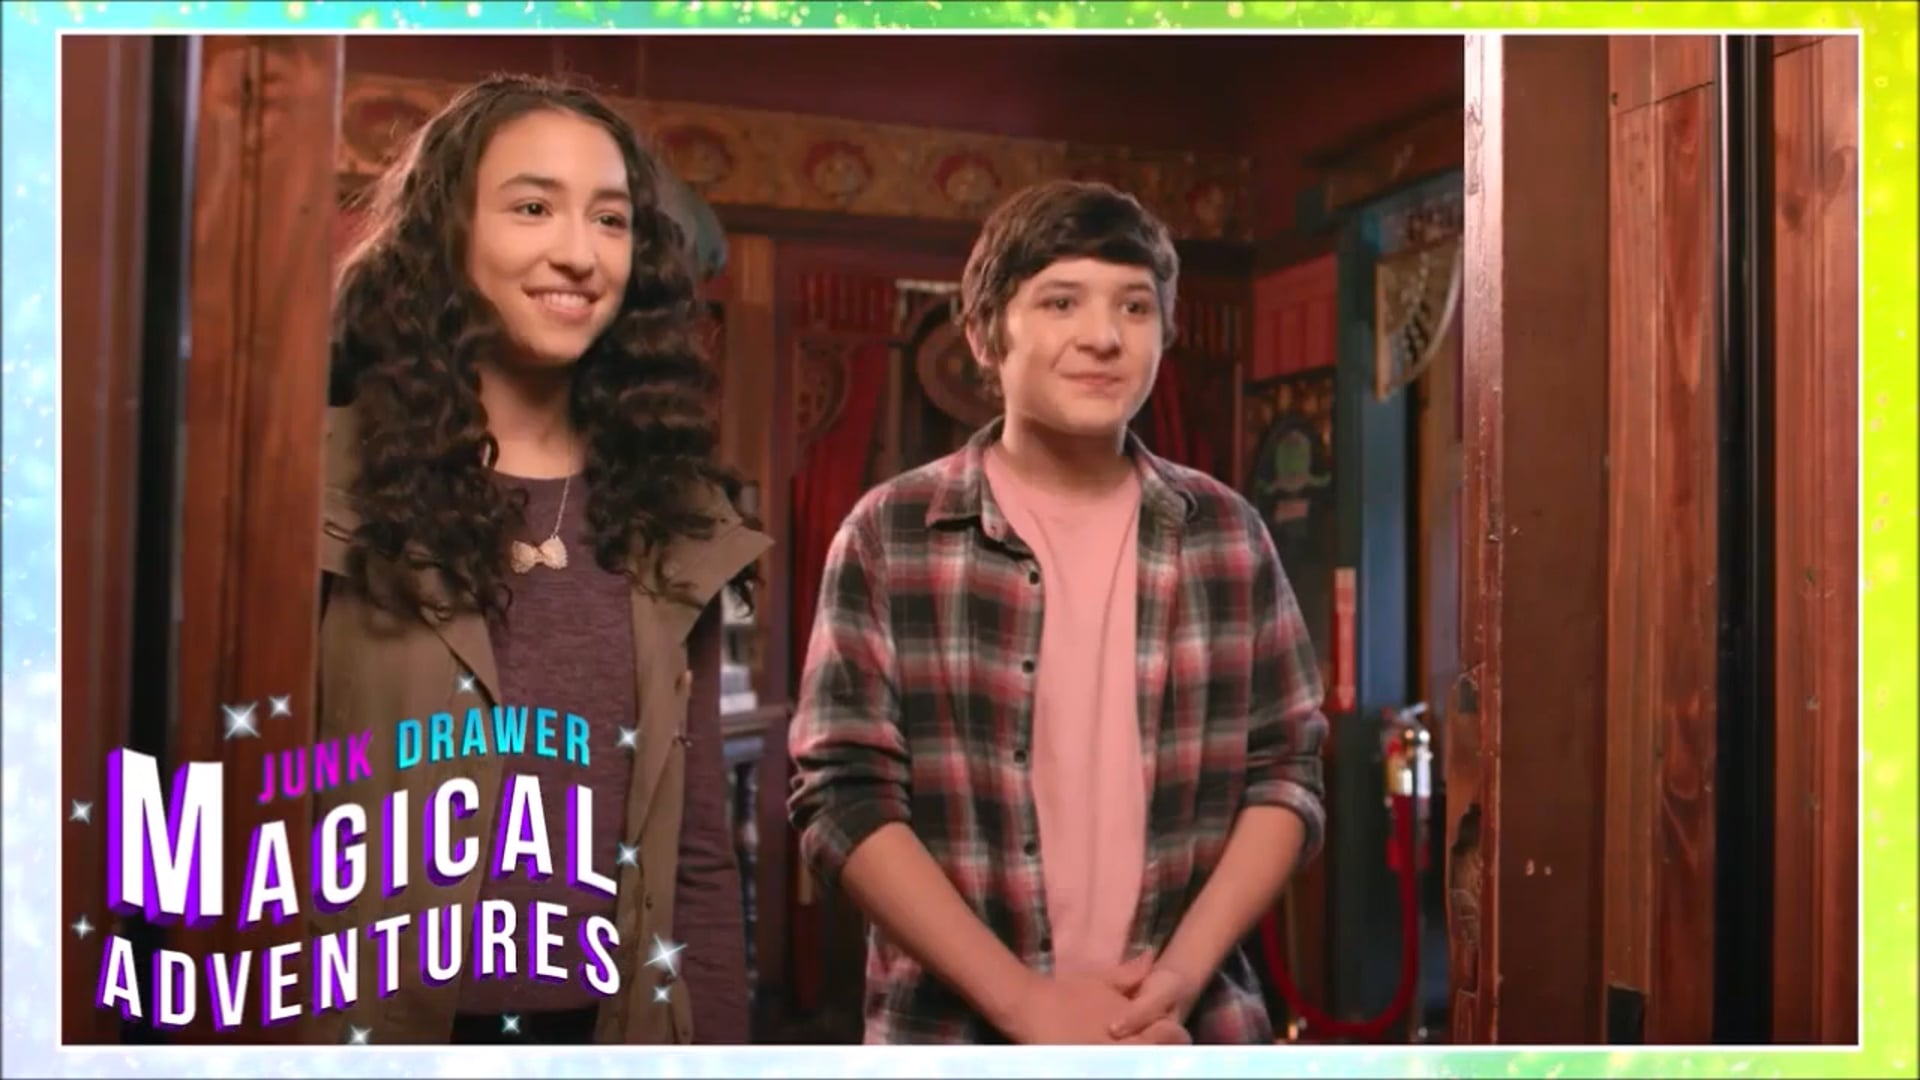 Junk Drawer Magical Adventures - Trailer